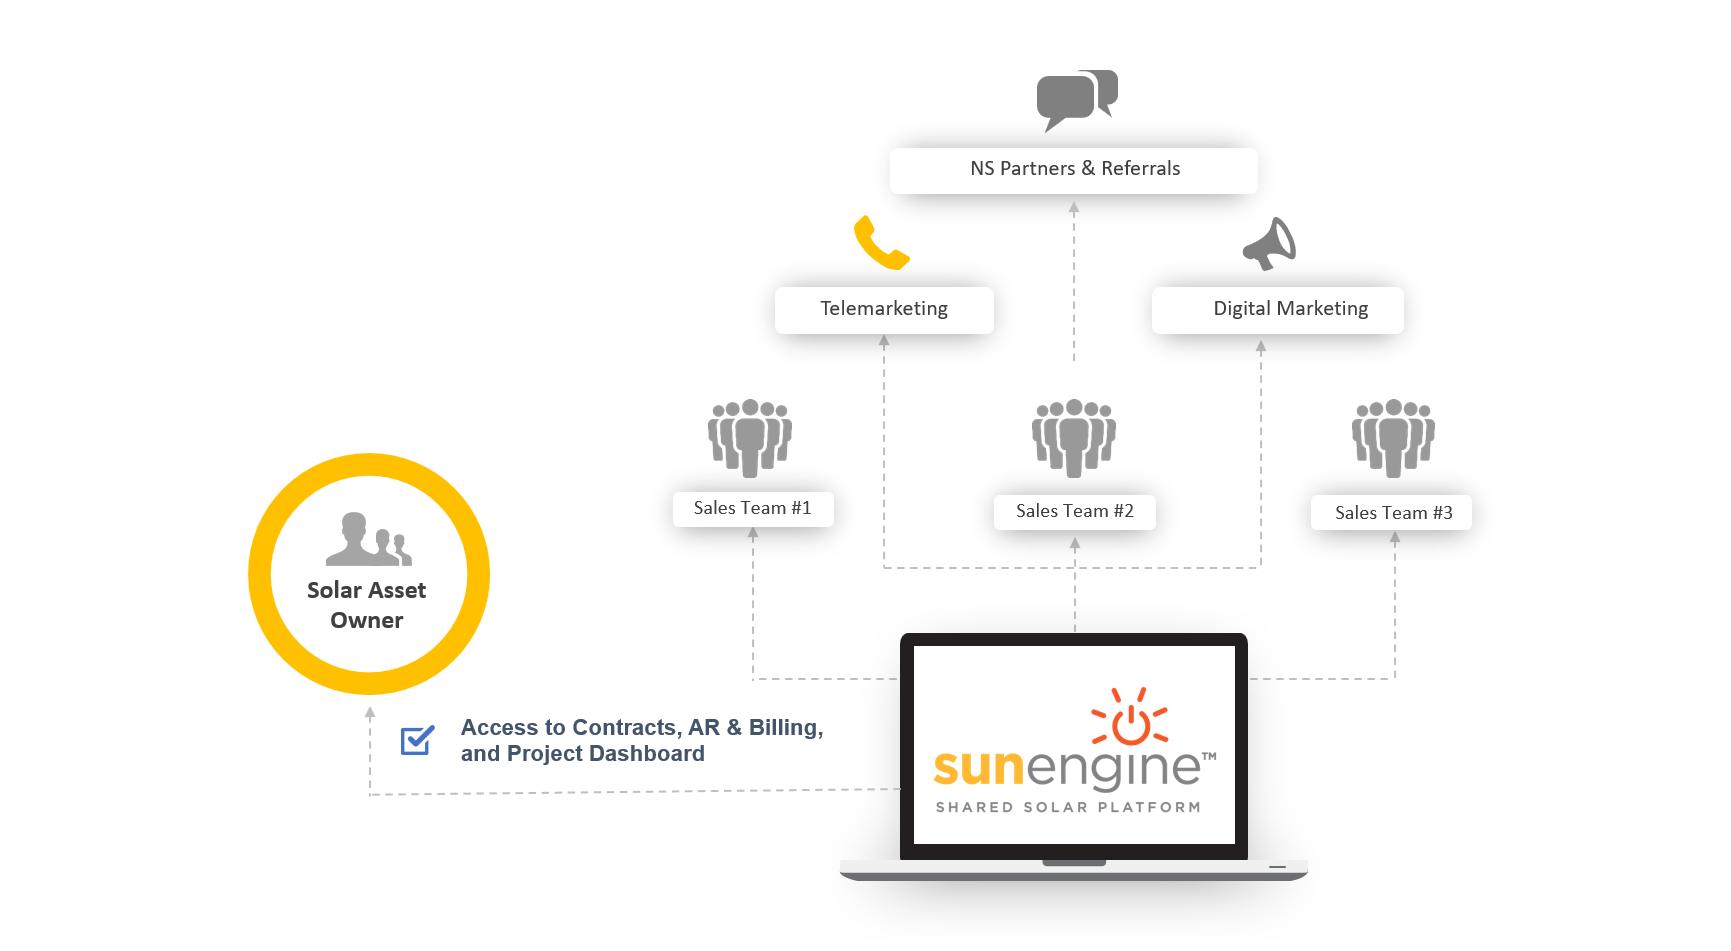 sunengine management platform